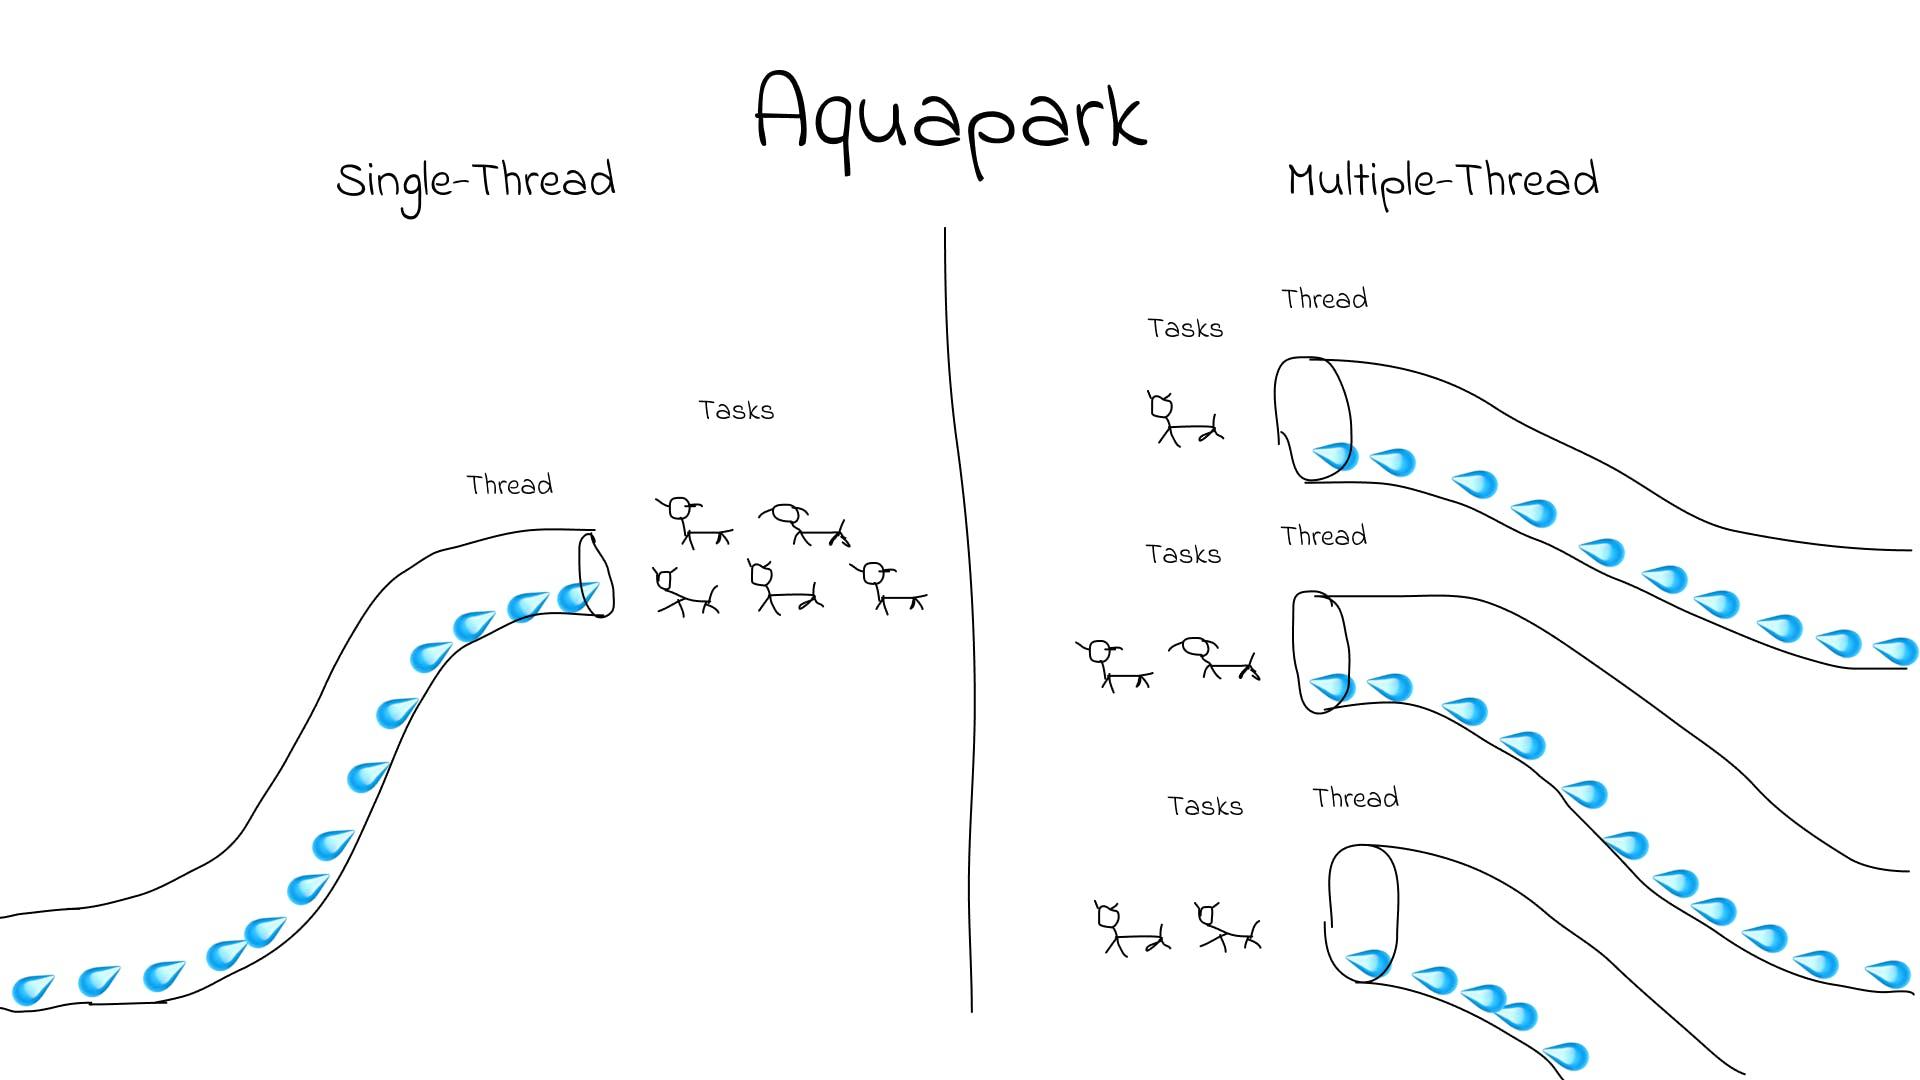 sing thread vs multiple thread.png